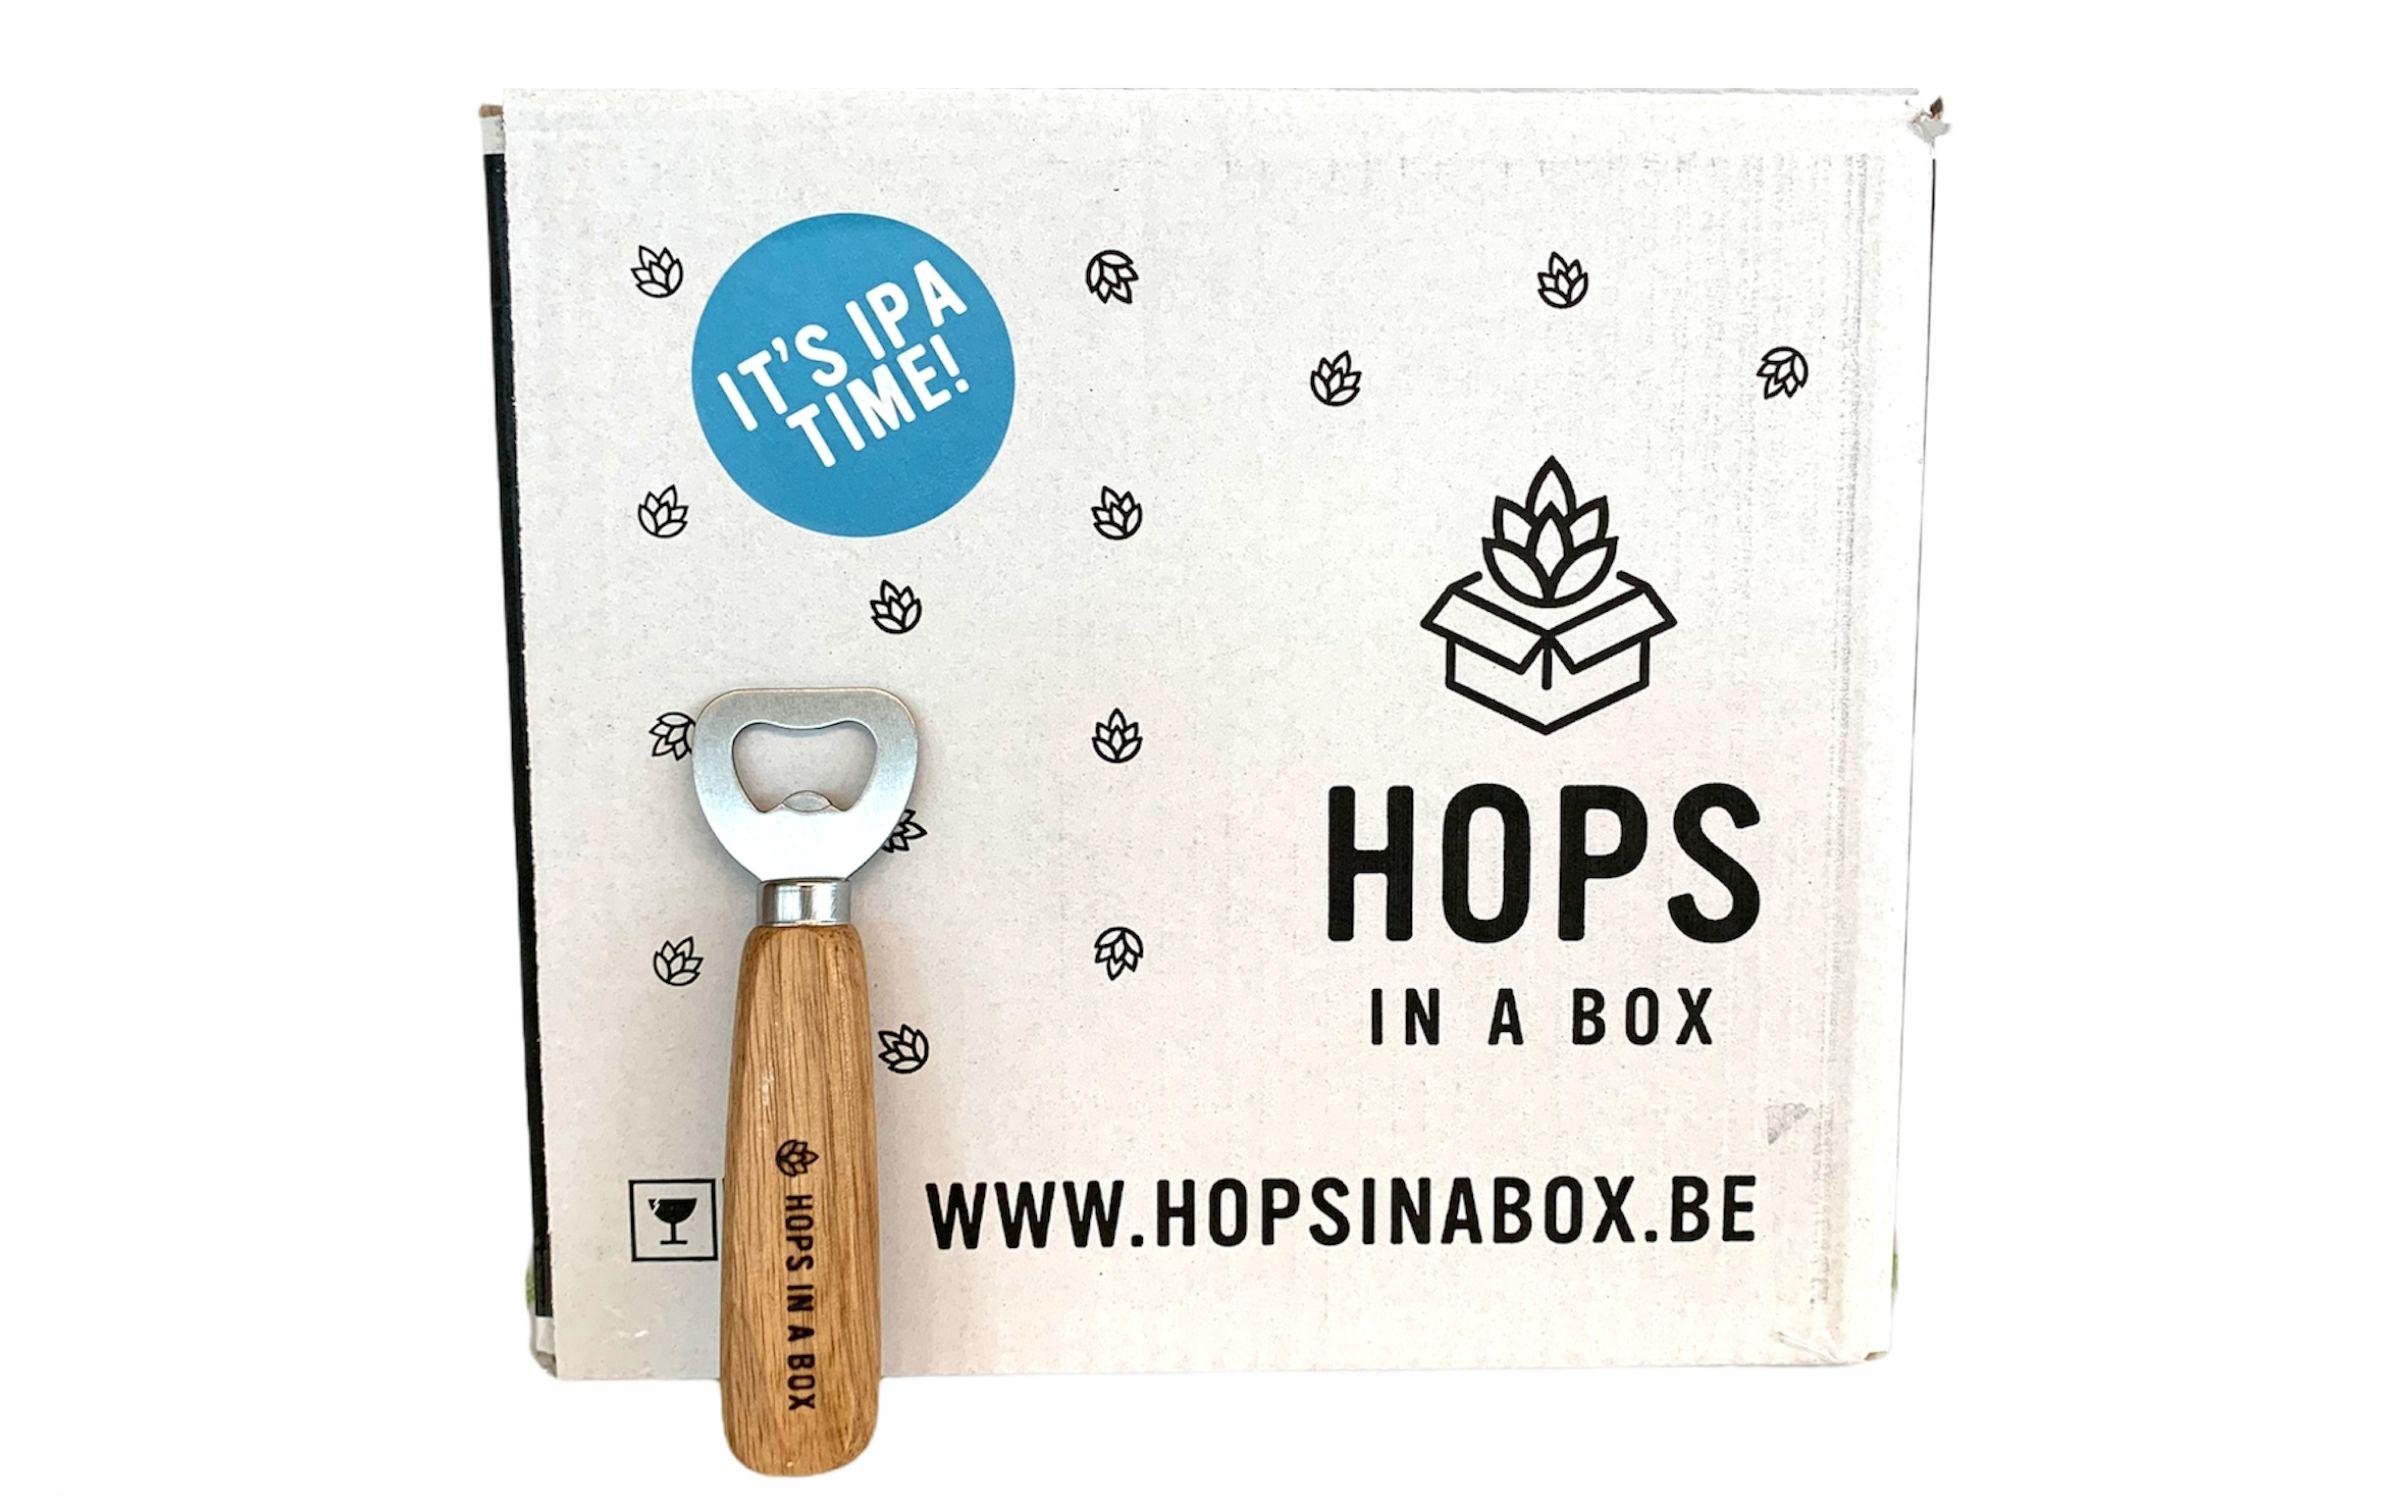 IPA Bierpakket - bieropener